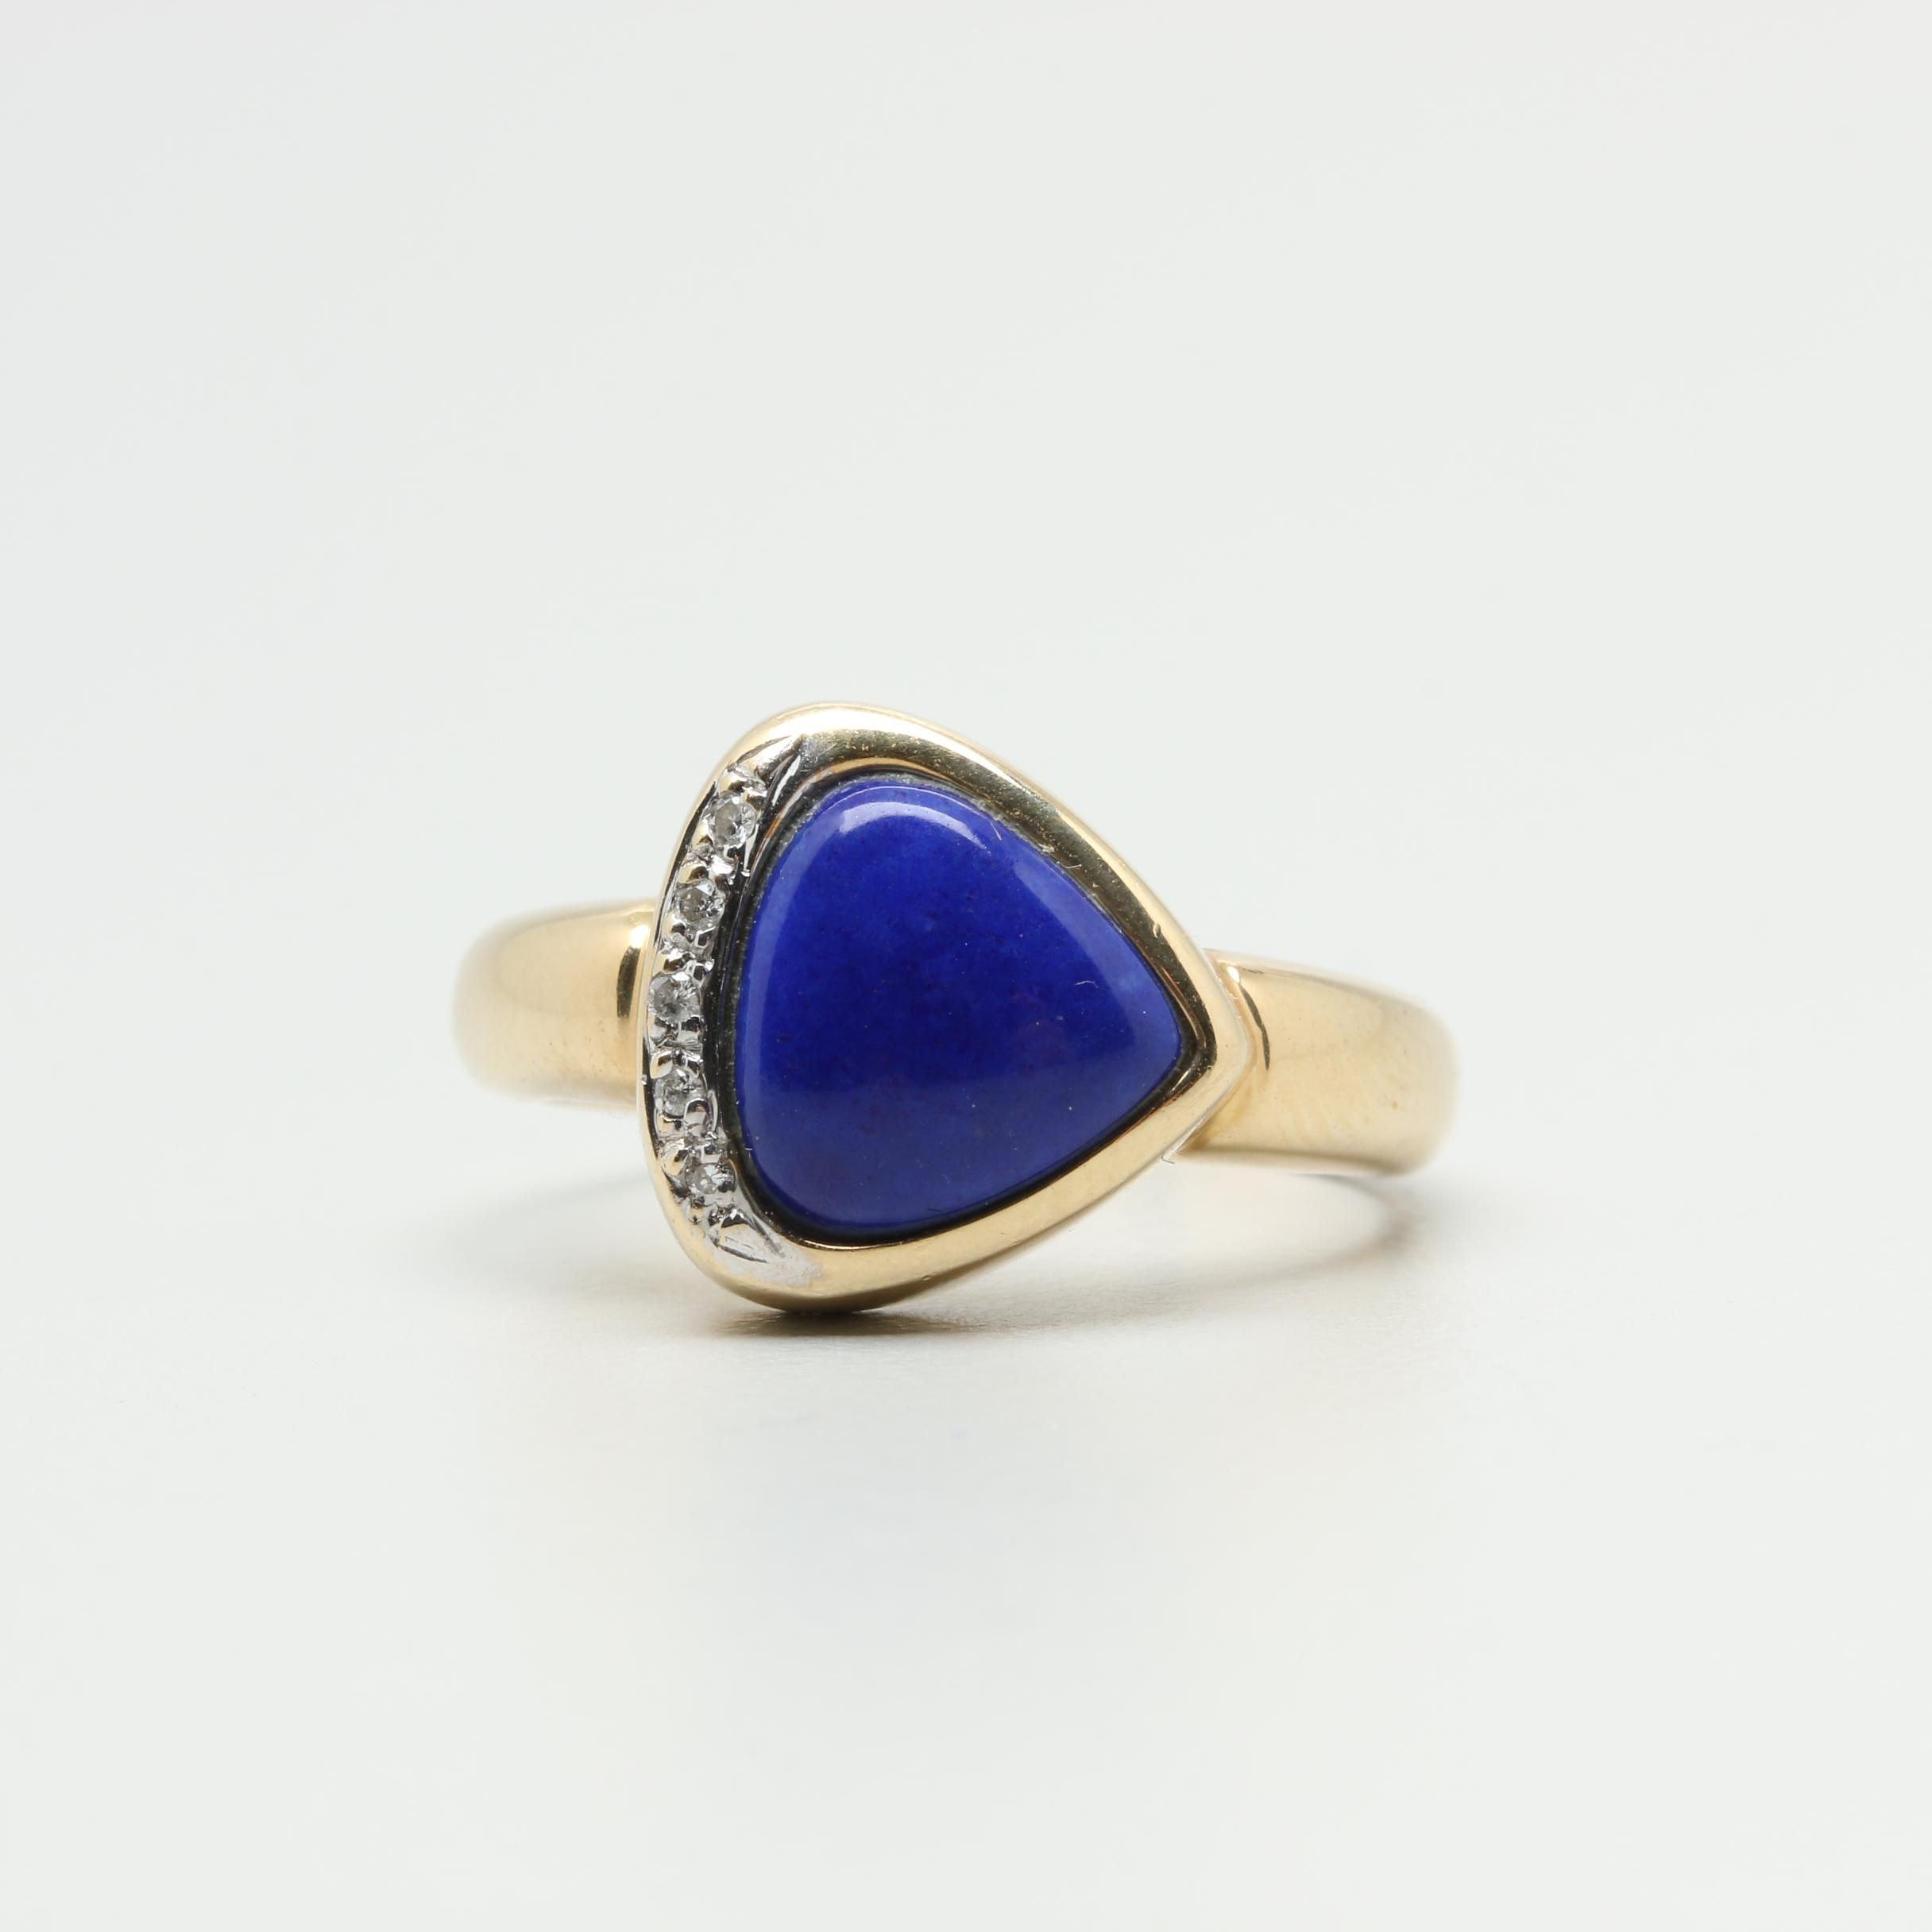 14K Yellow Gold Lapis Lazuli and Diamond Ring